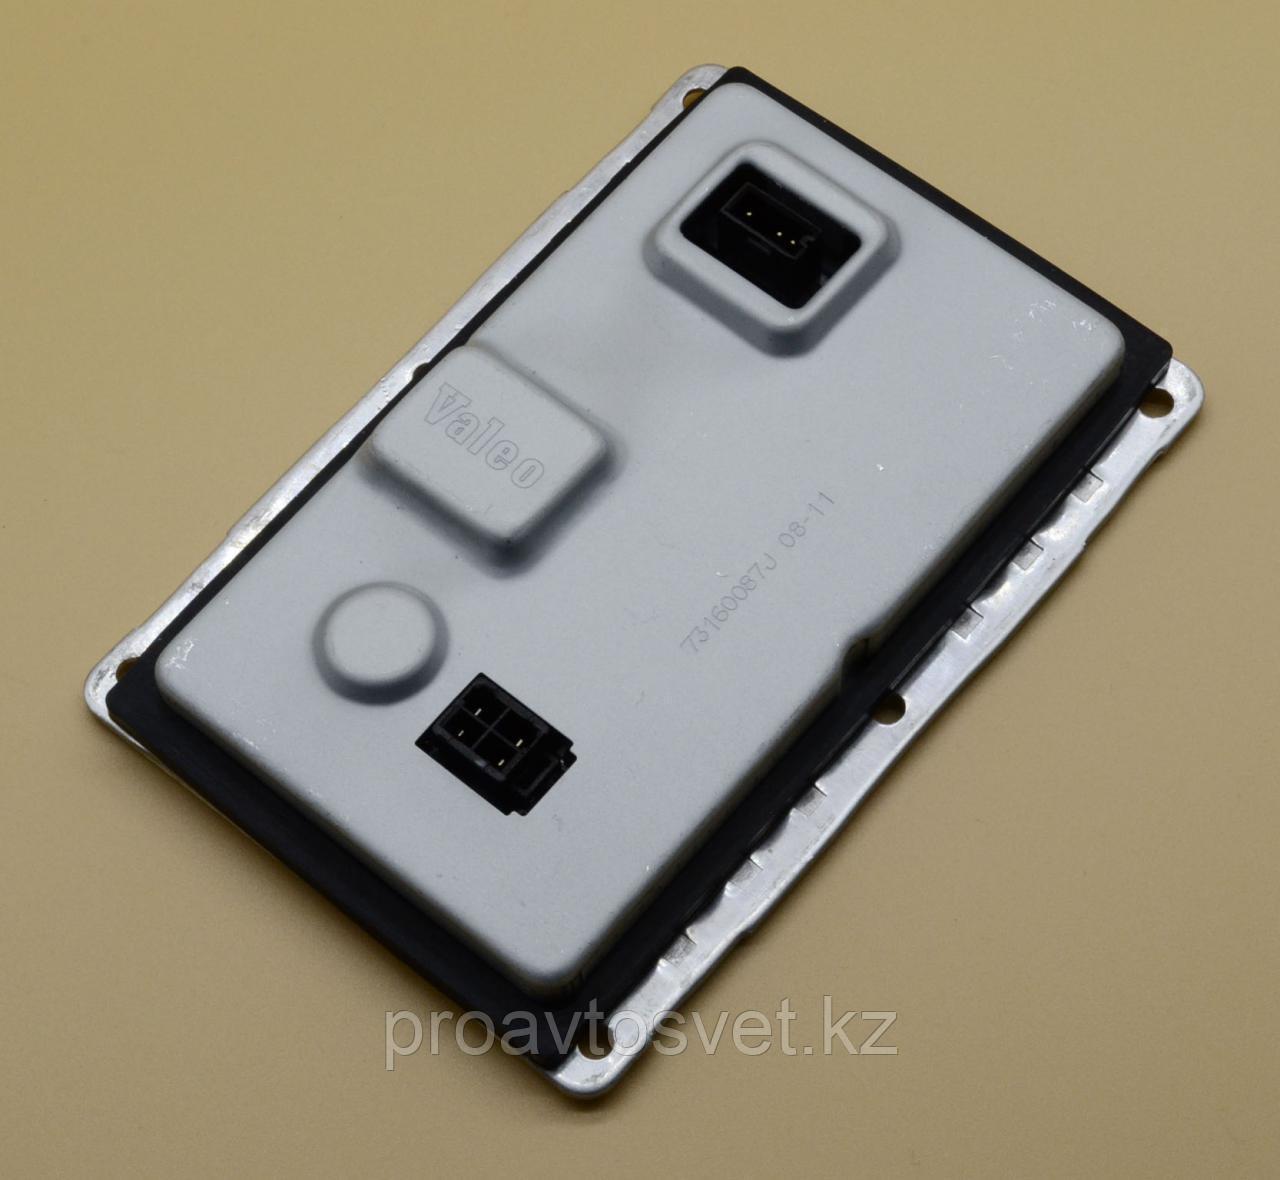 Valeo Lad5gl ballast 4 pins 30674786-6 306747866 AUDI 3D0907391B, 8E0907391A VW 3D0907391B BMW 63126938561